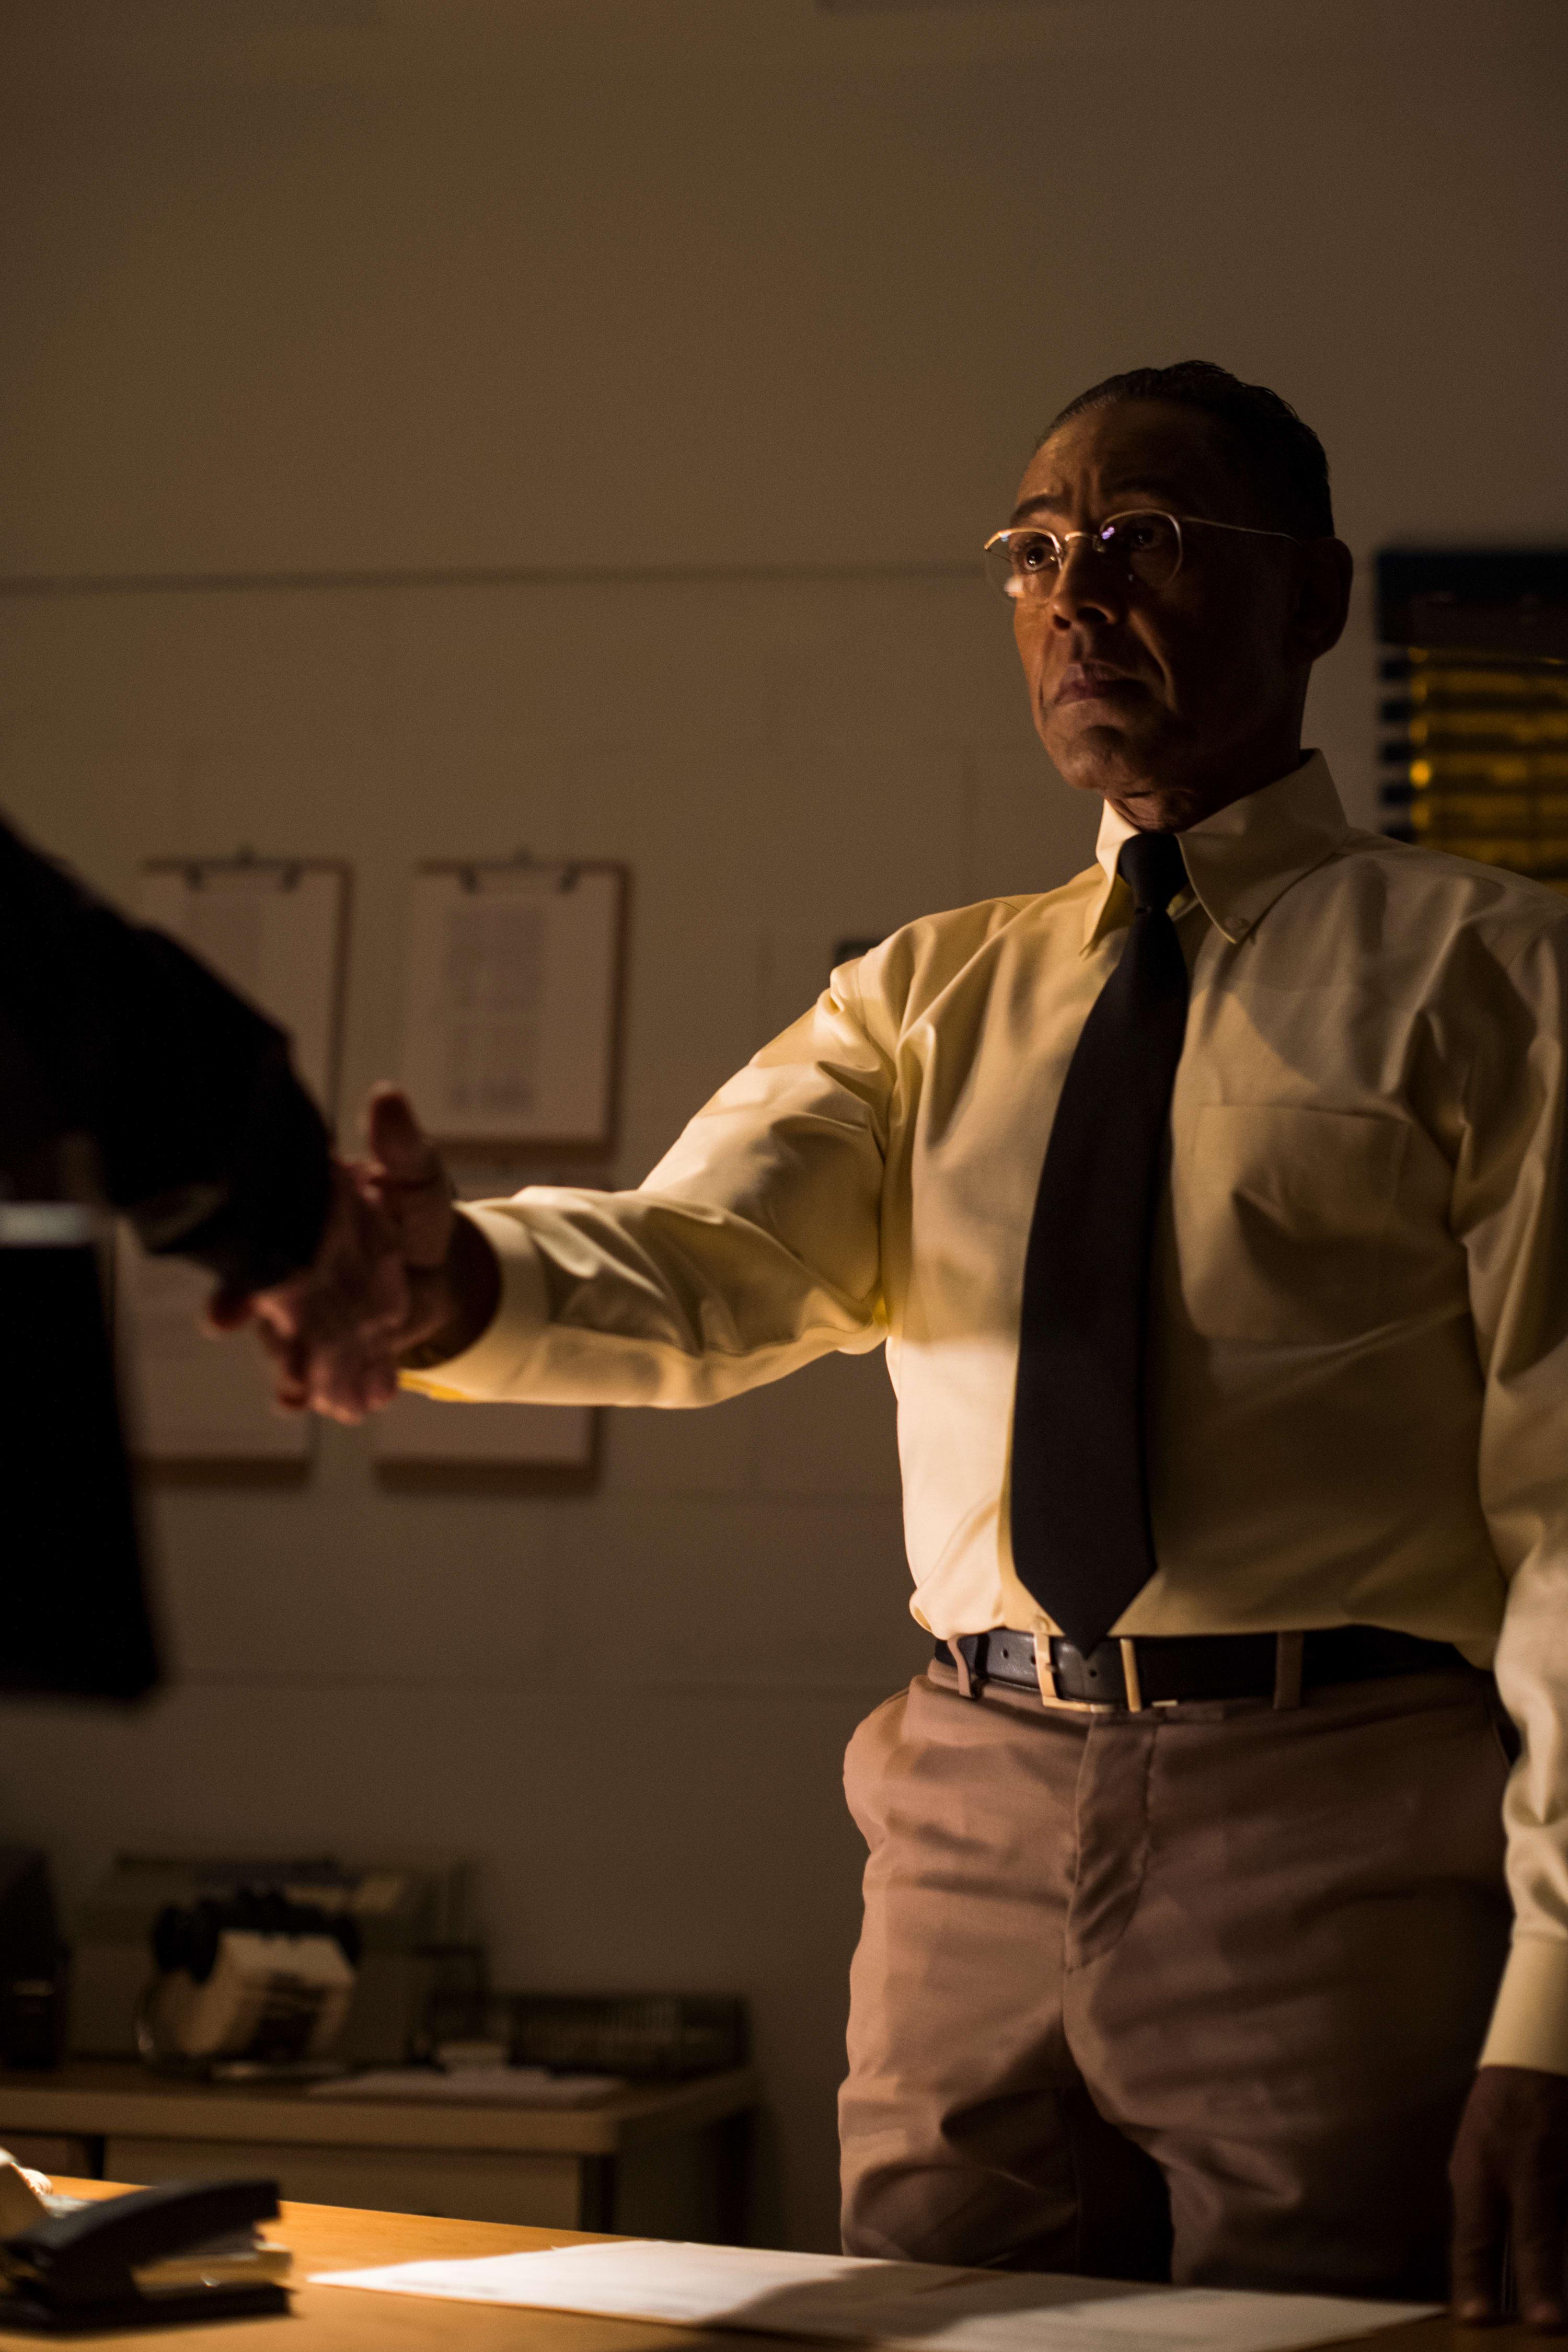 Being human season 3 episode 8 2011 - Mike And Gus Make An Agreement Better Call Saul Season 3 Episode 8